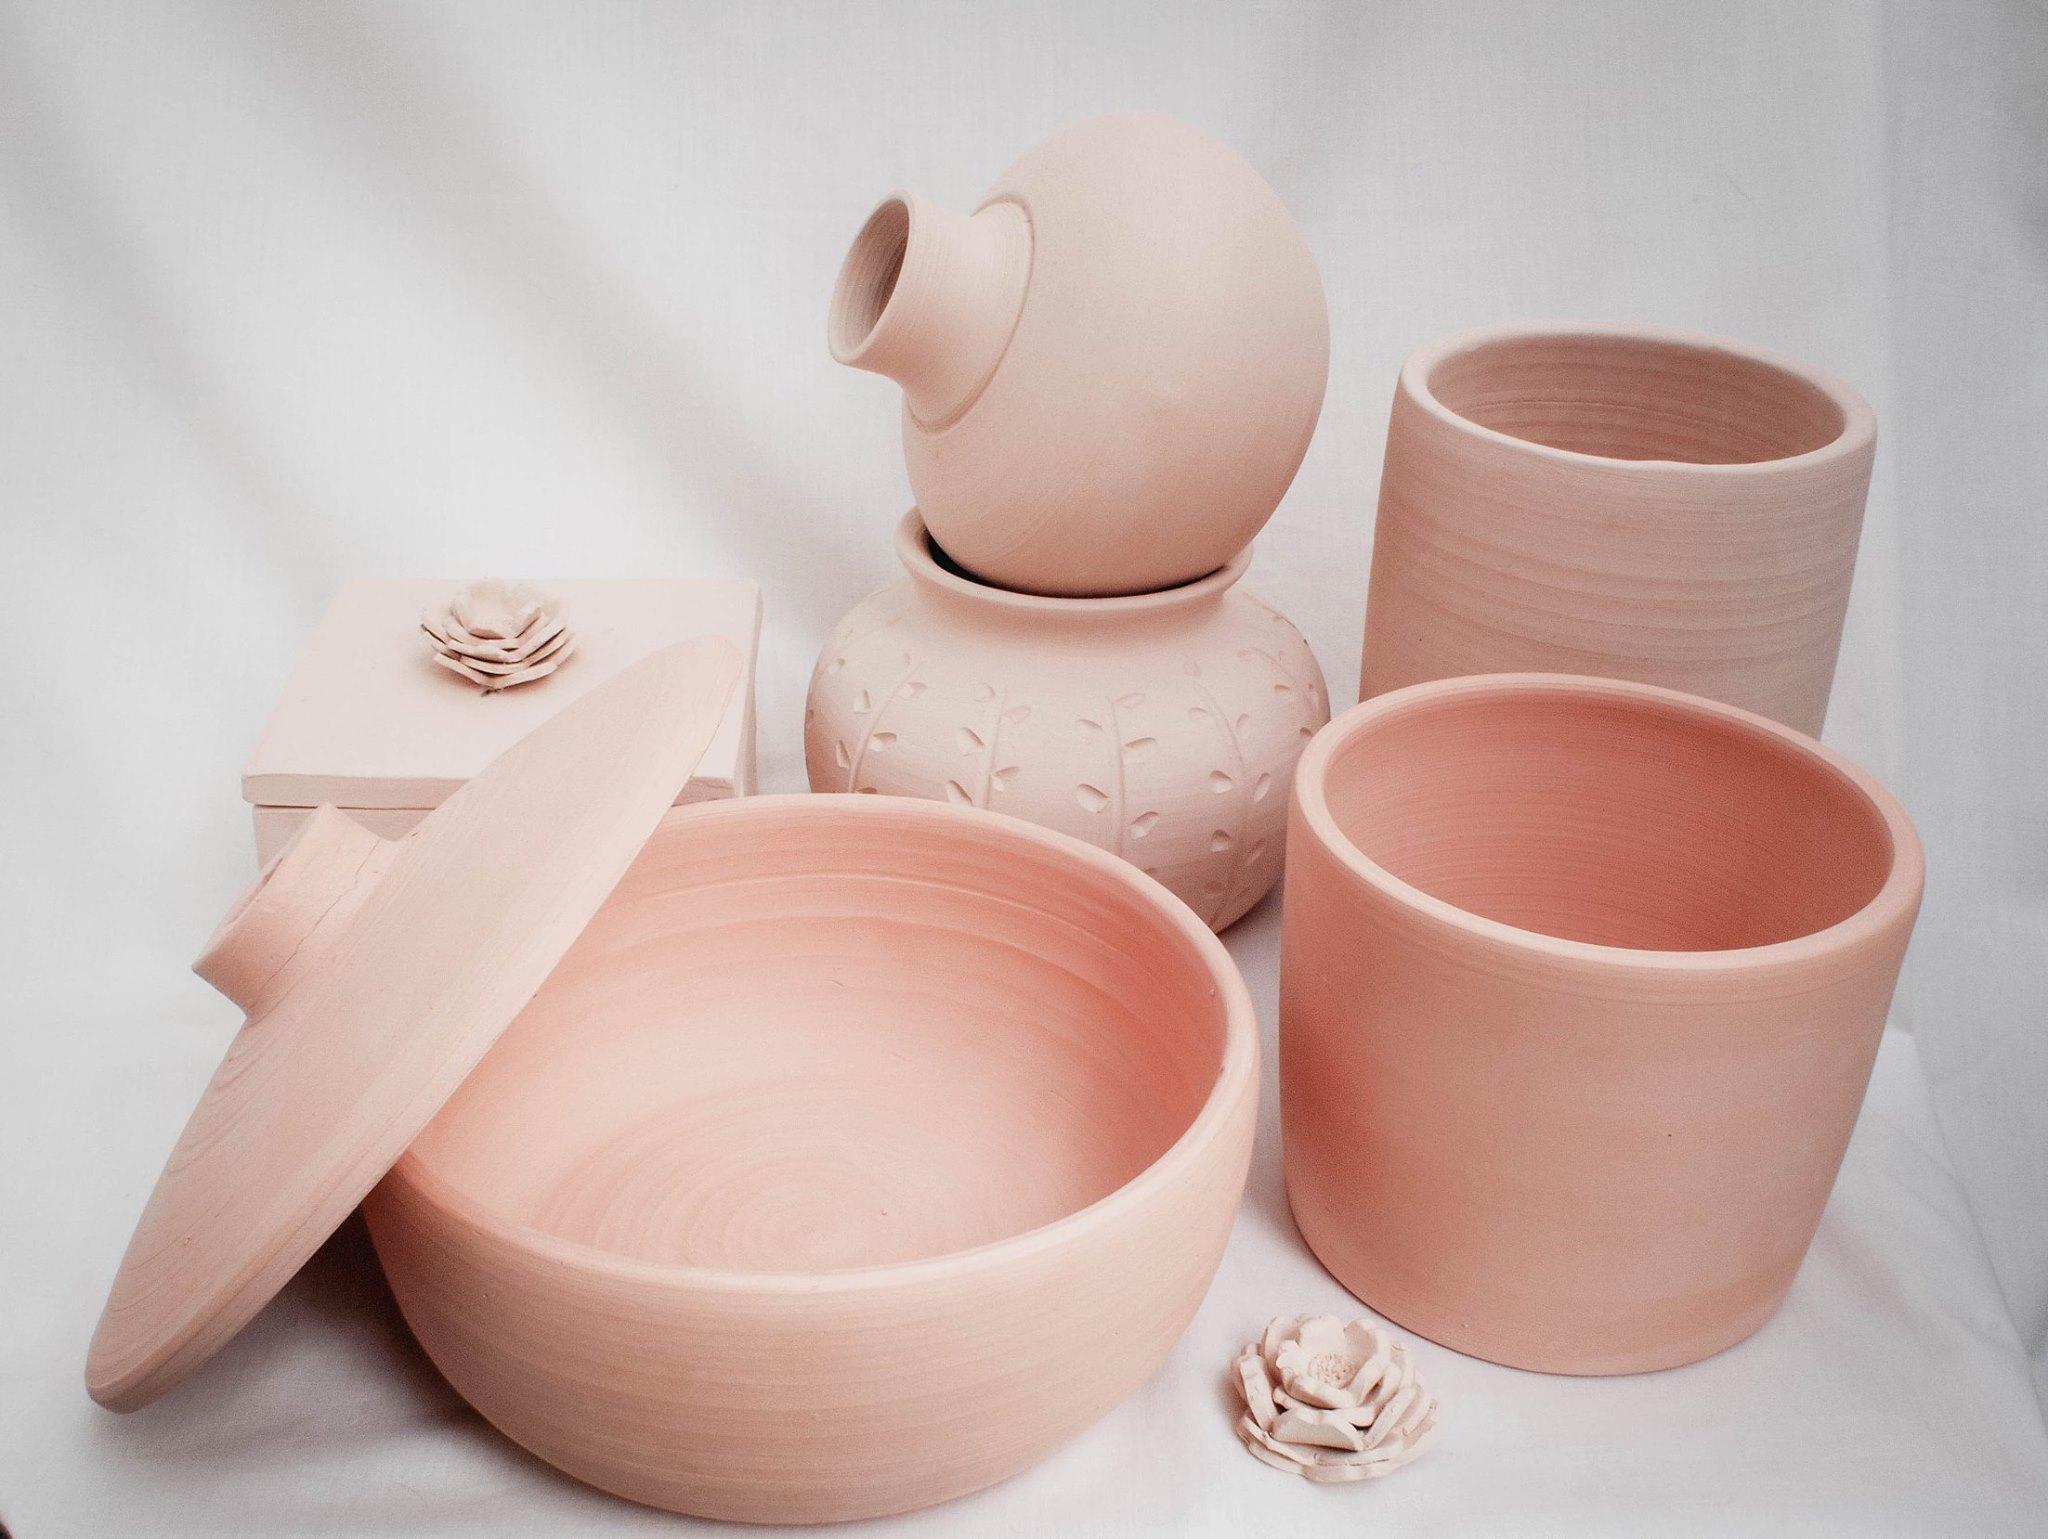 Lớp học làm gốm Sài Gòn-Meow pottery elledecoration vn 15